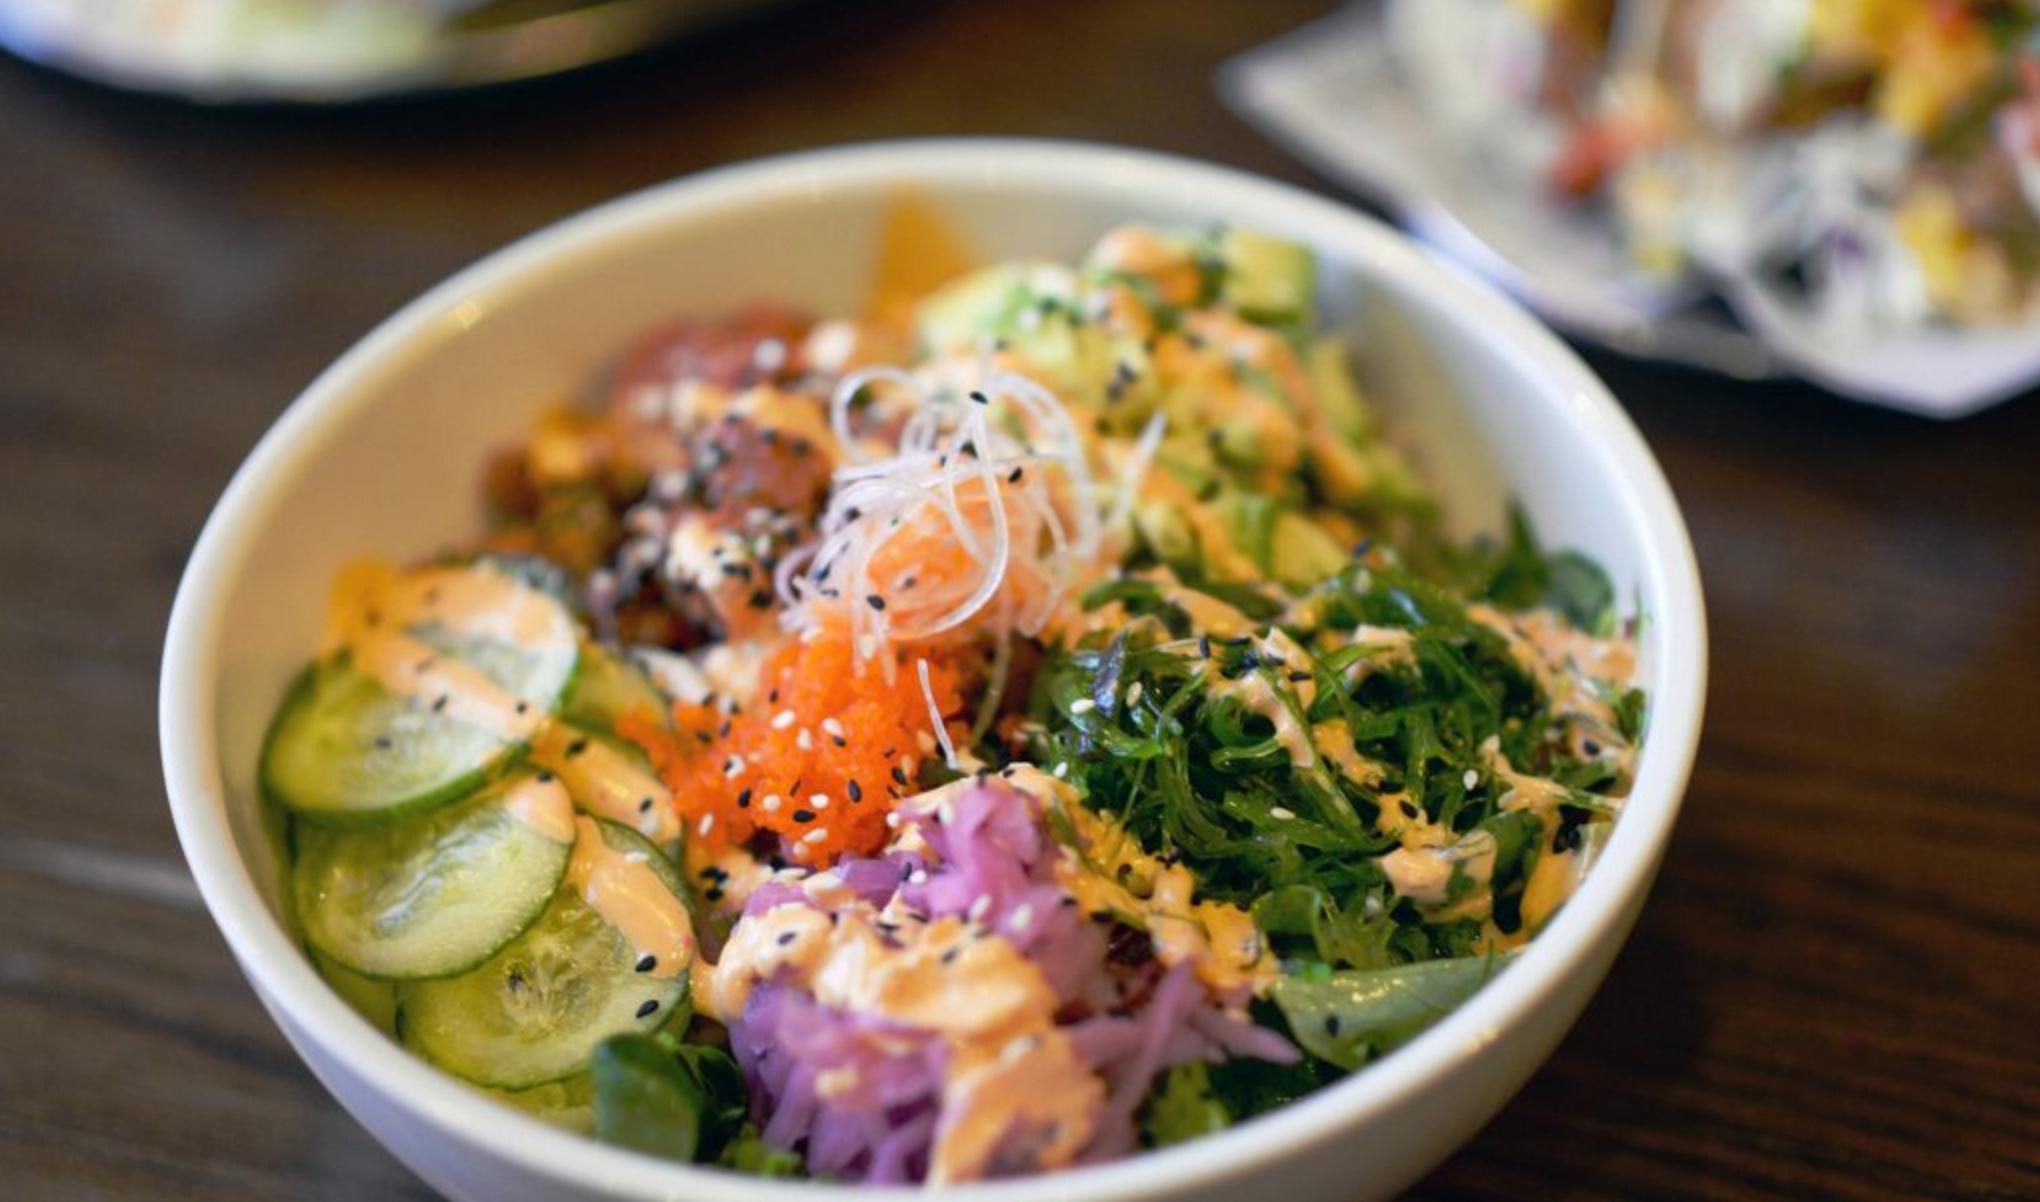 healthy eating options las vegas sports bar